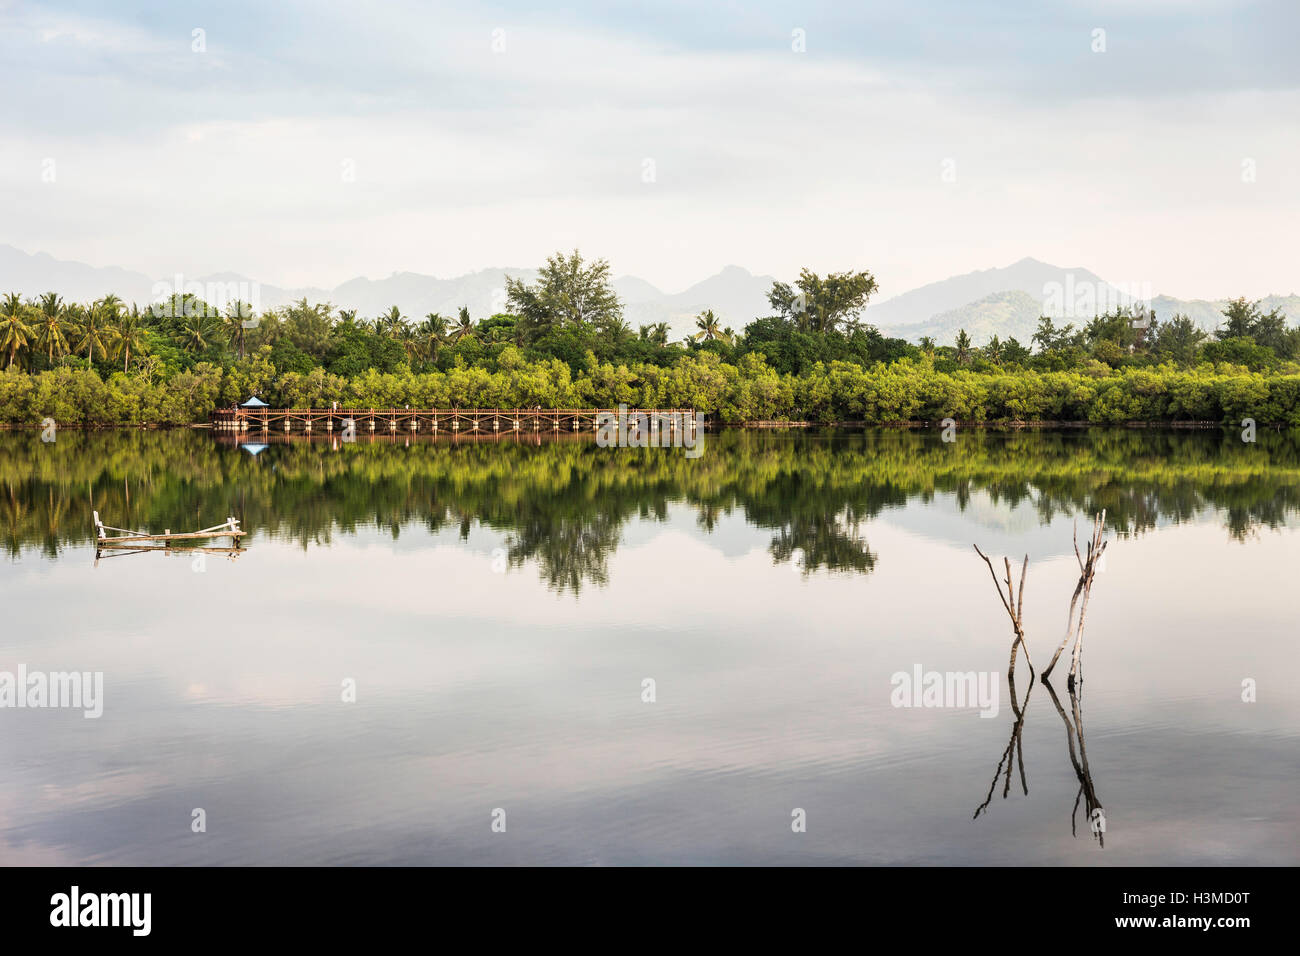 View of lake, Gili Meno, Lombok, Indonesia - Stock Image